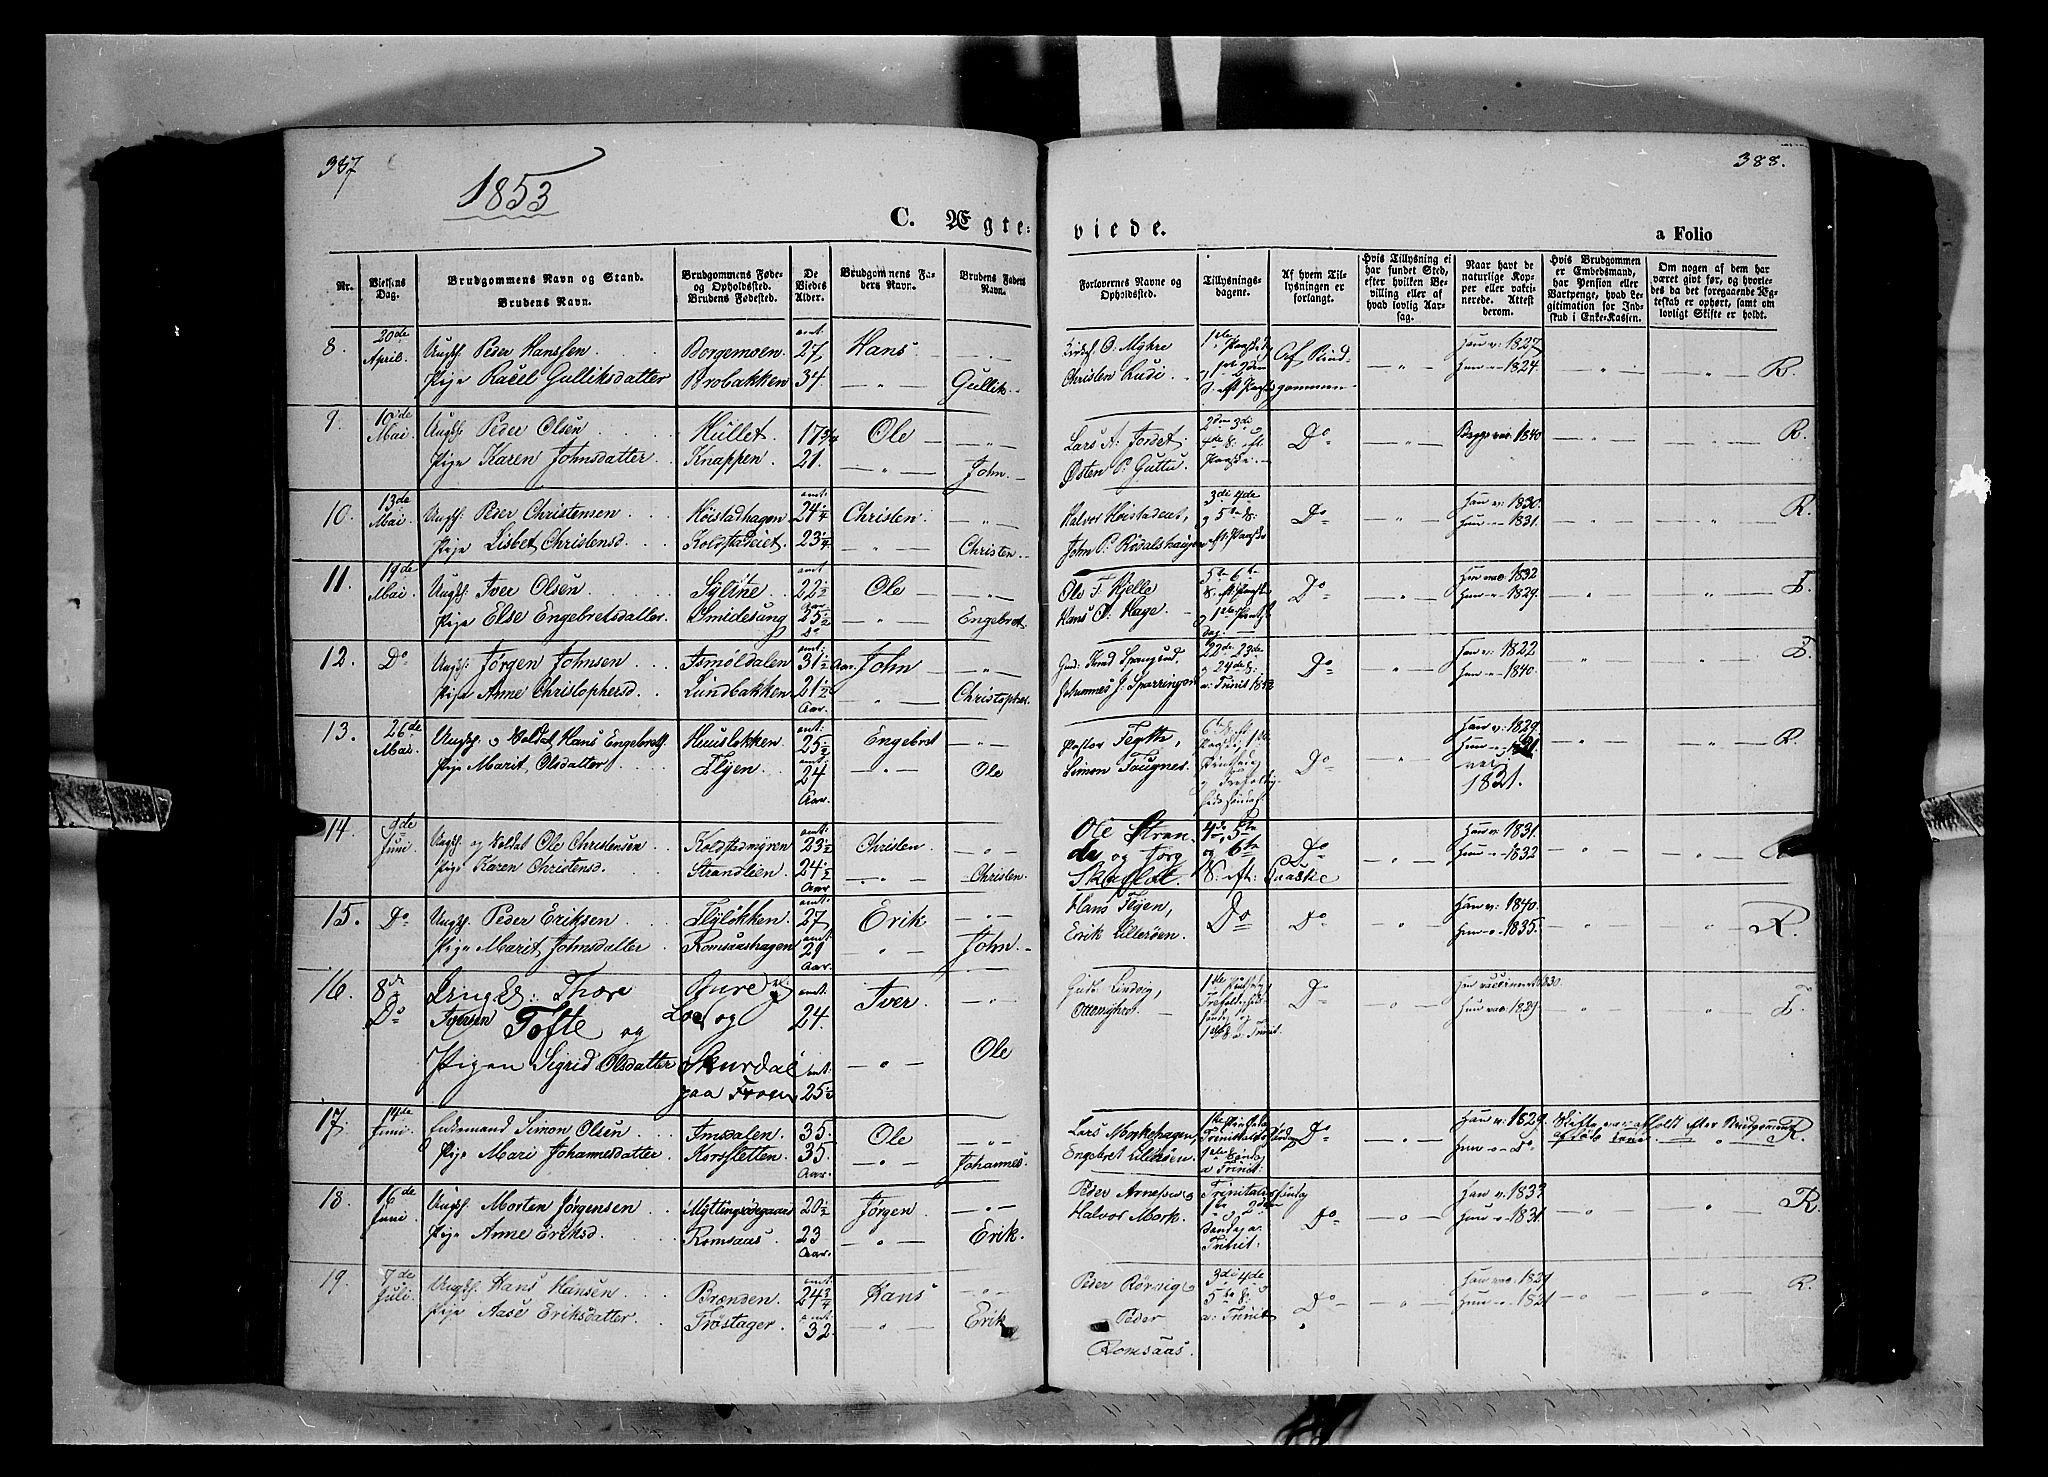 SAH, Ringebu prestekontor, Ministerialbok nr. 6, 1848-1859, s. 387-388